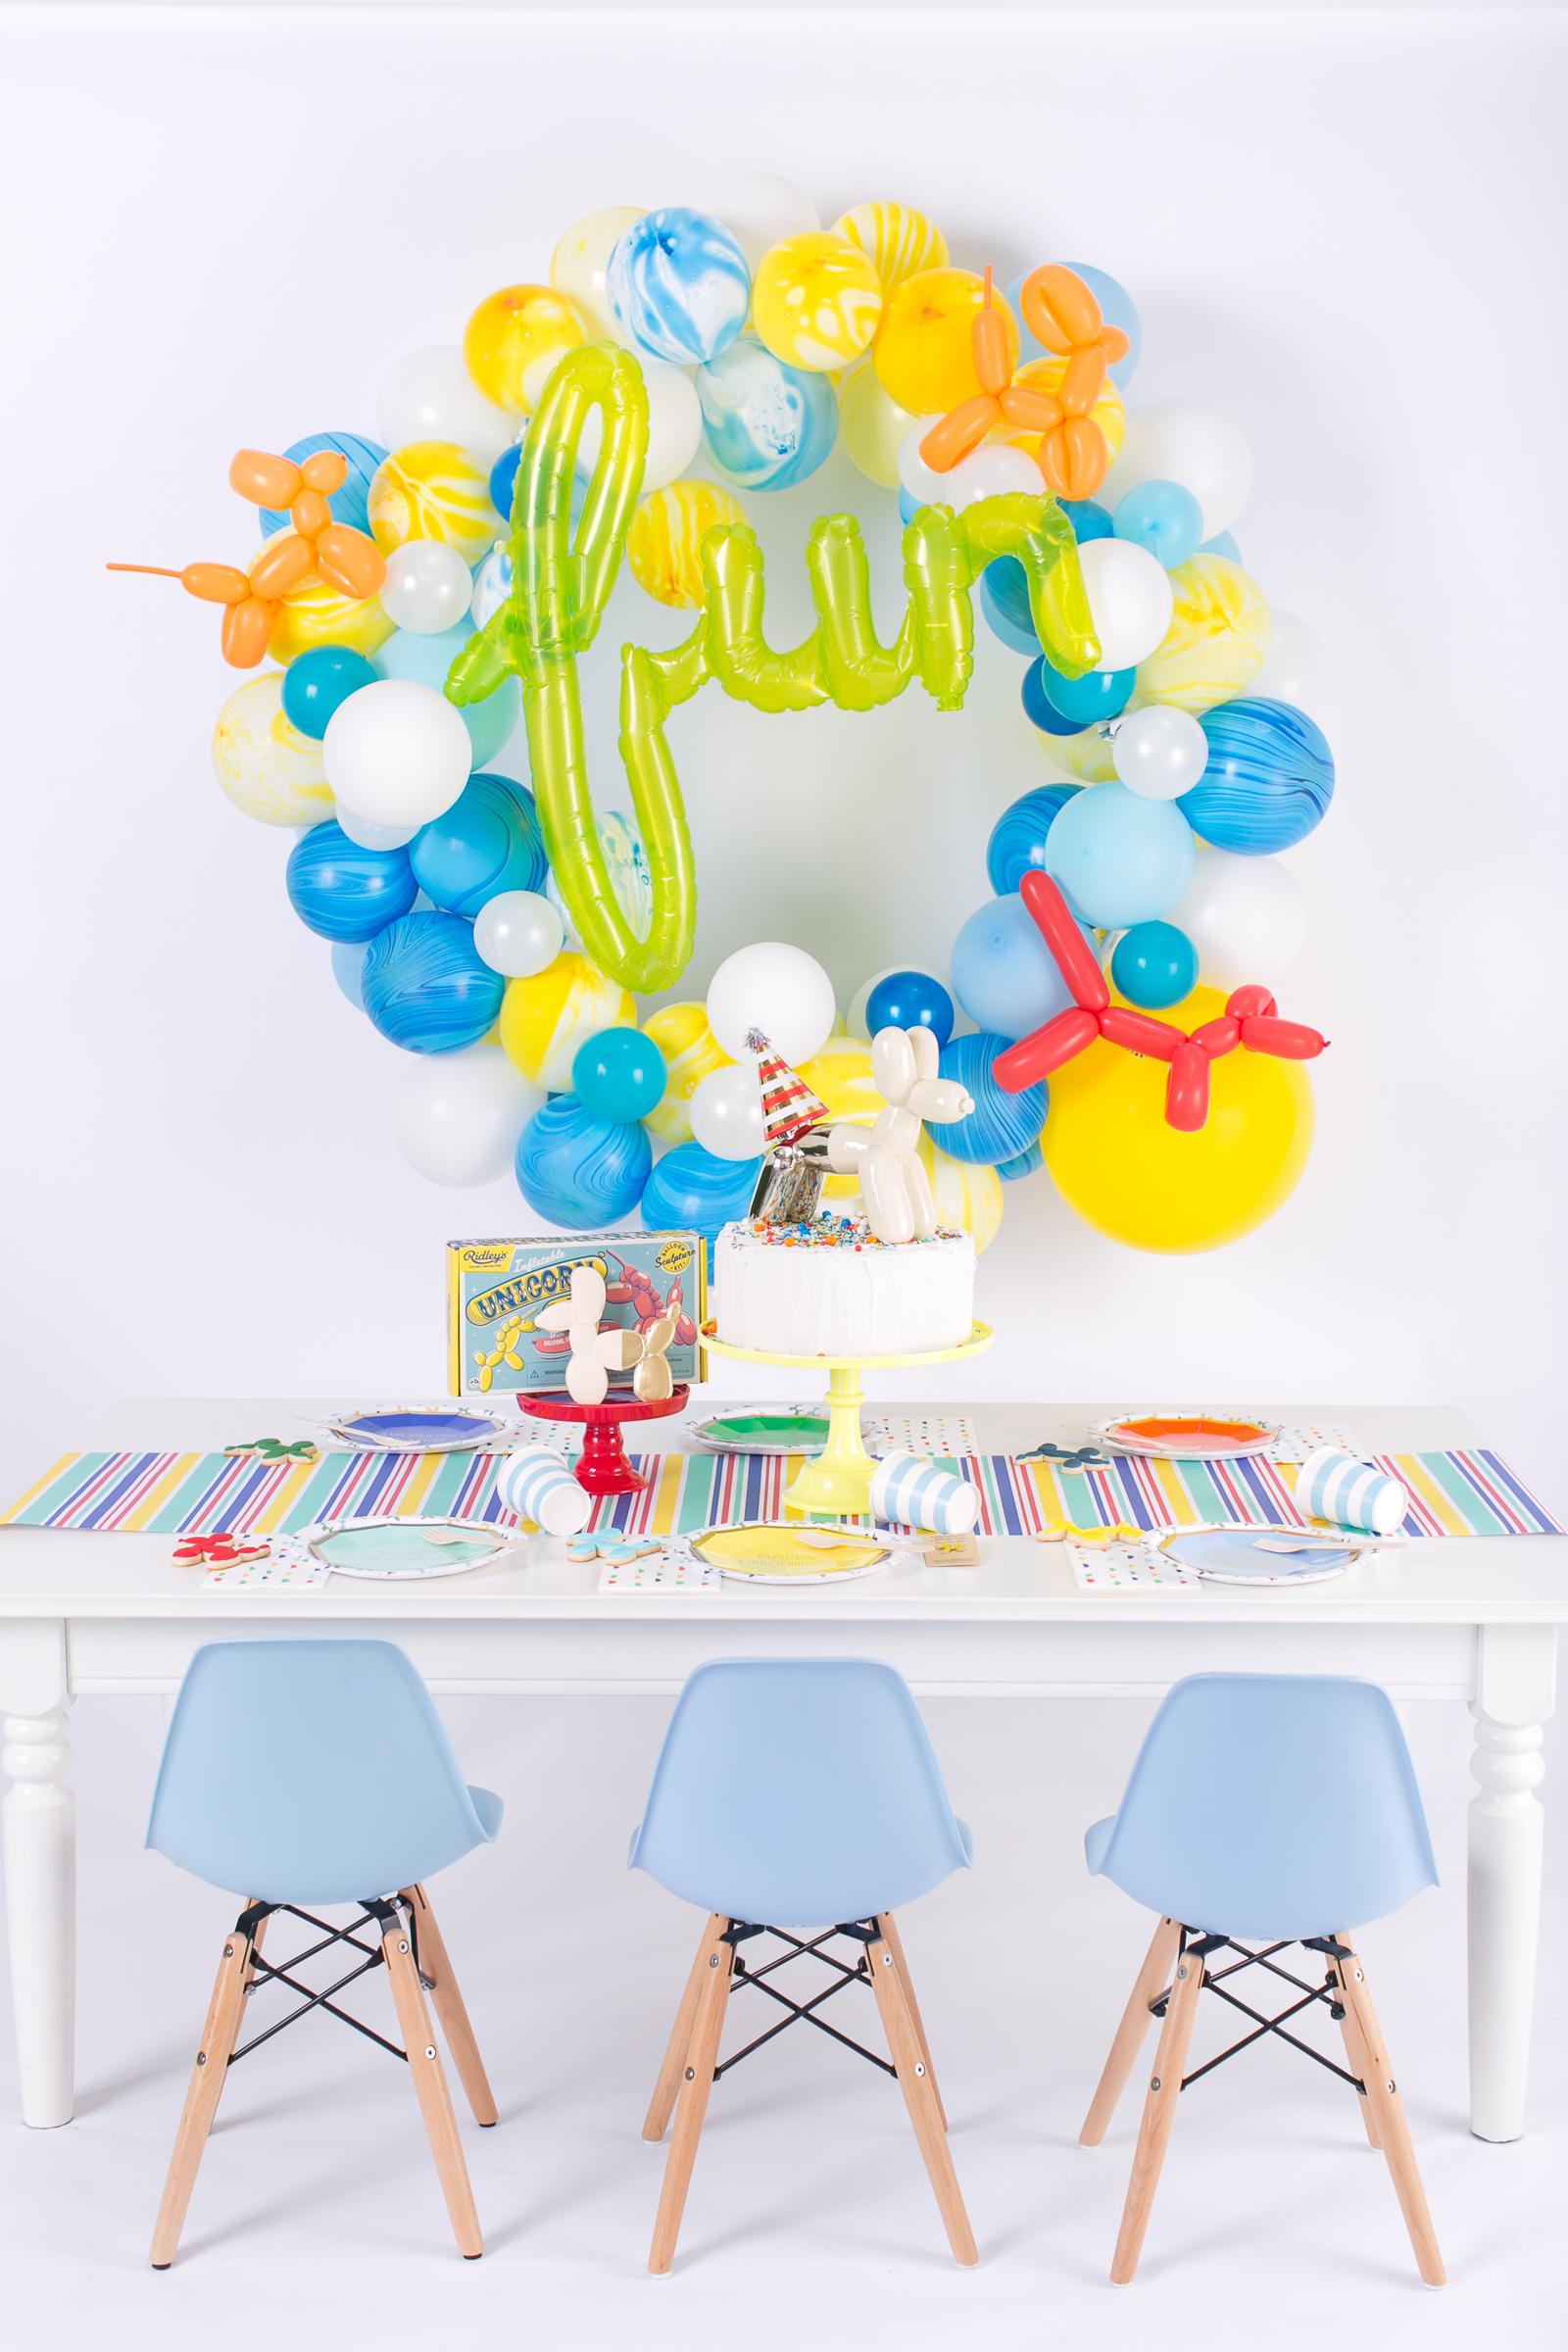 Balloon Animal Party Table and DIY Balloon Wreath